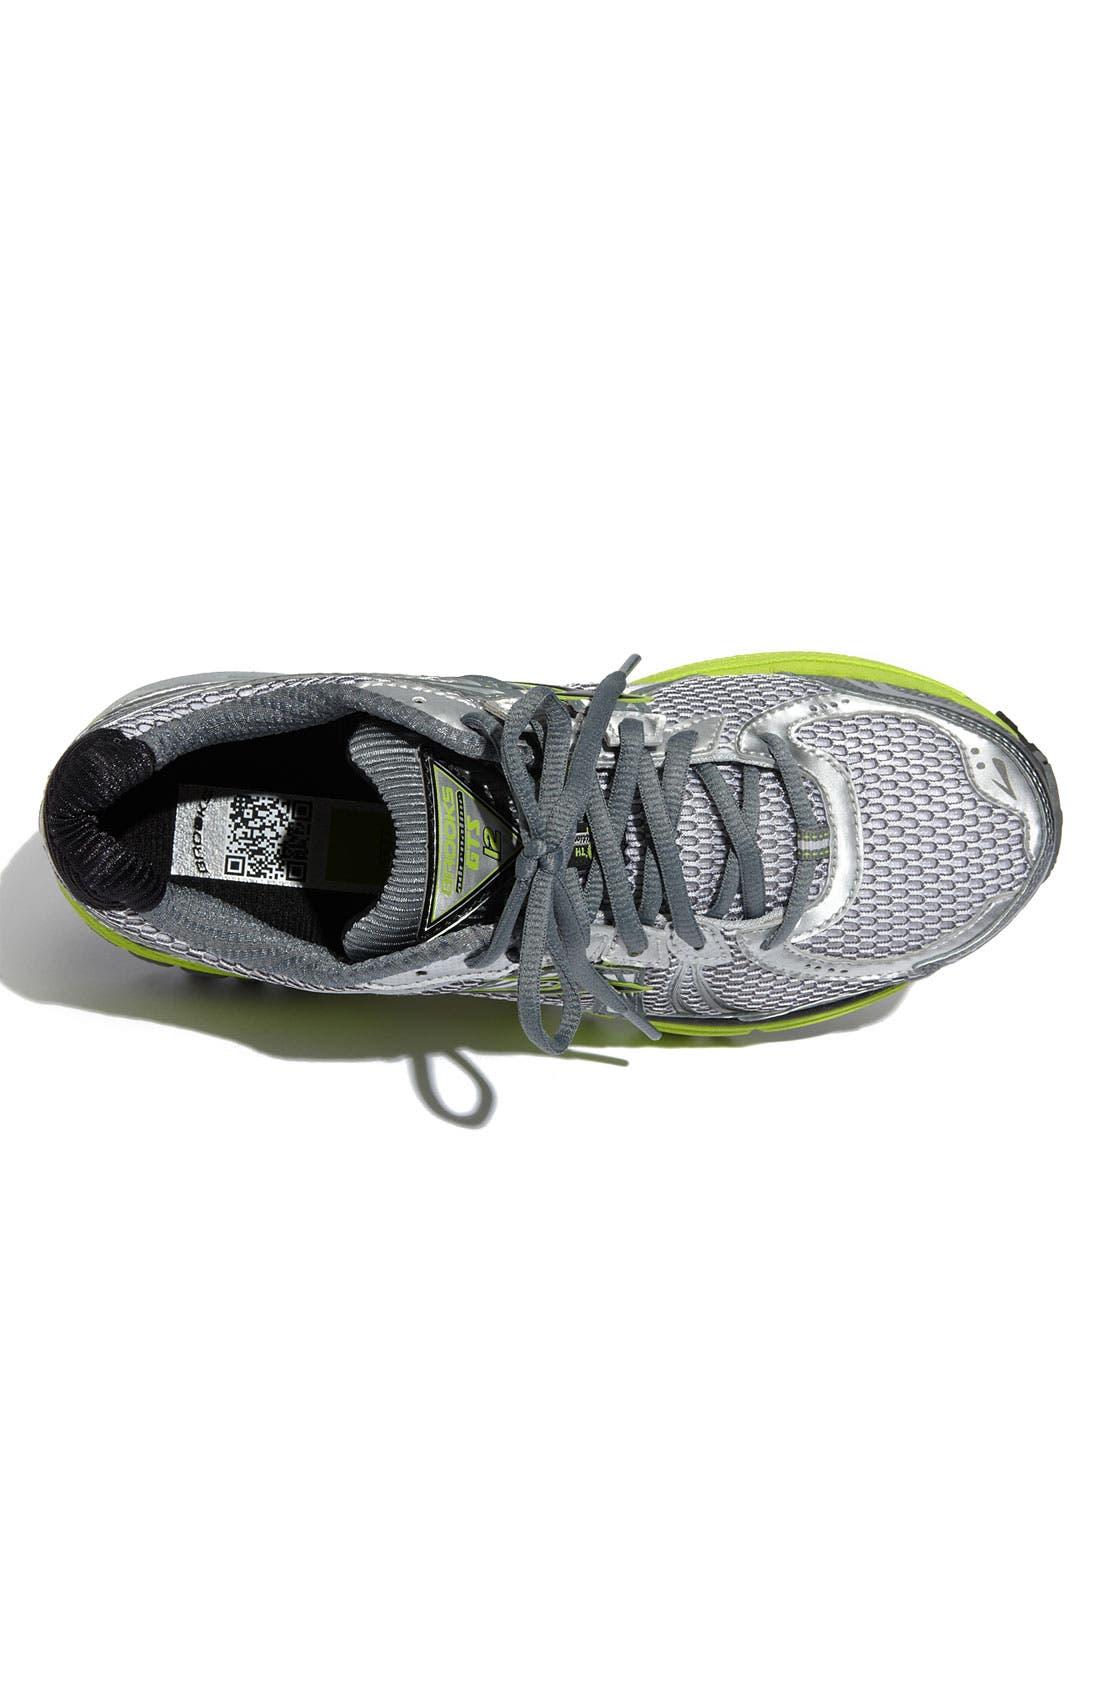 Alternate Image 3  - Brooks 'Adrenaline GTS 12' Running Shoe (Men)